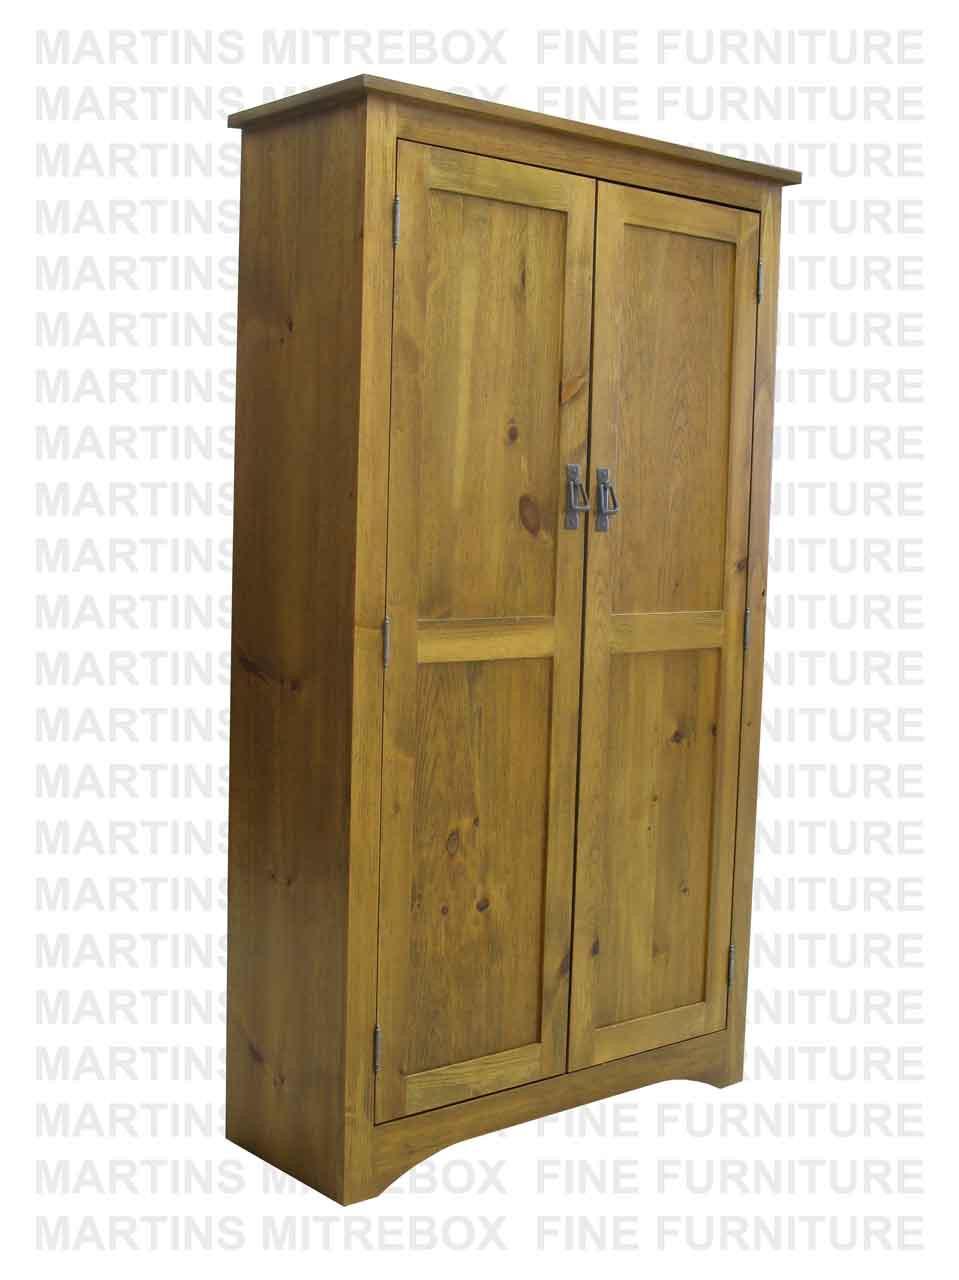 Oak Montana Double Jelly Cabinet 13 Deep X 35 Wide X 60 High